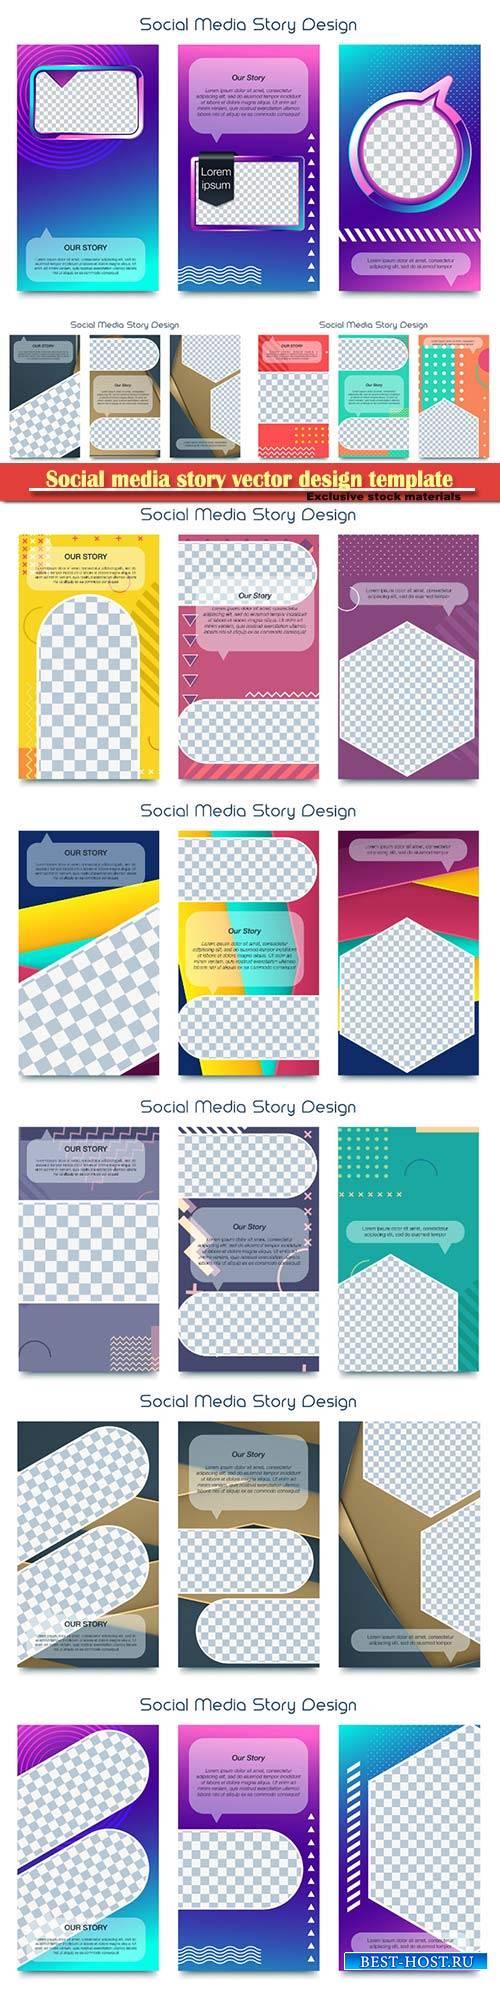 Social media story vector design template